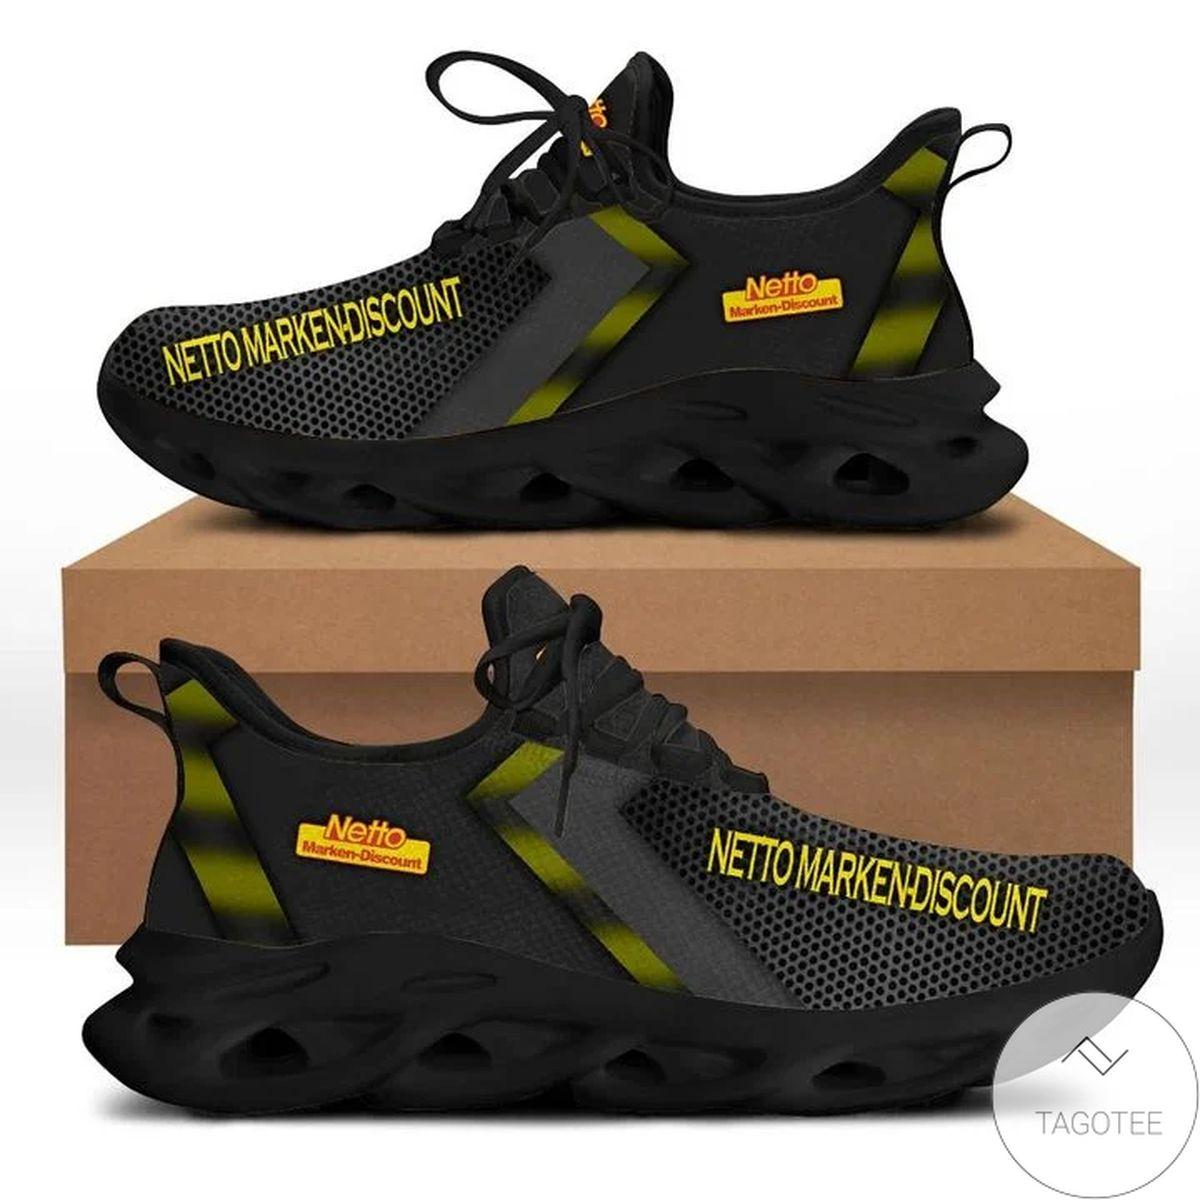 Netto Marken-discount Max Soul Shoes